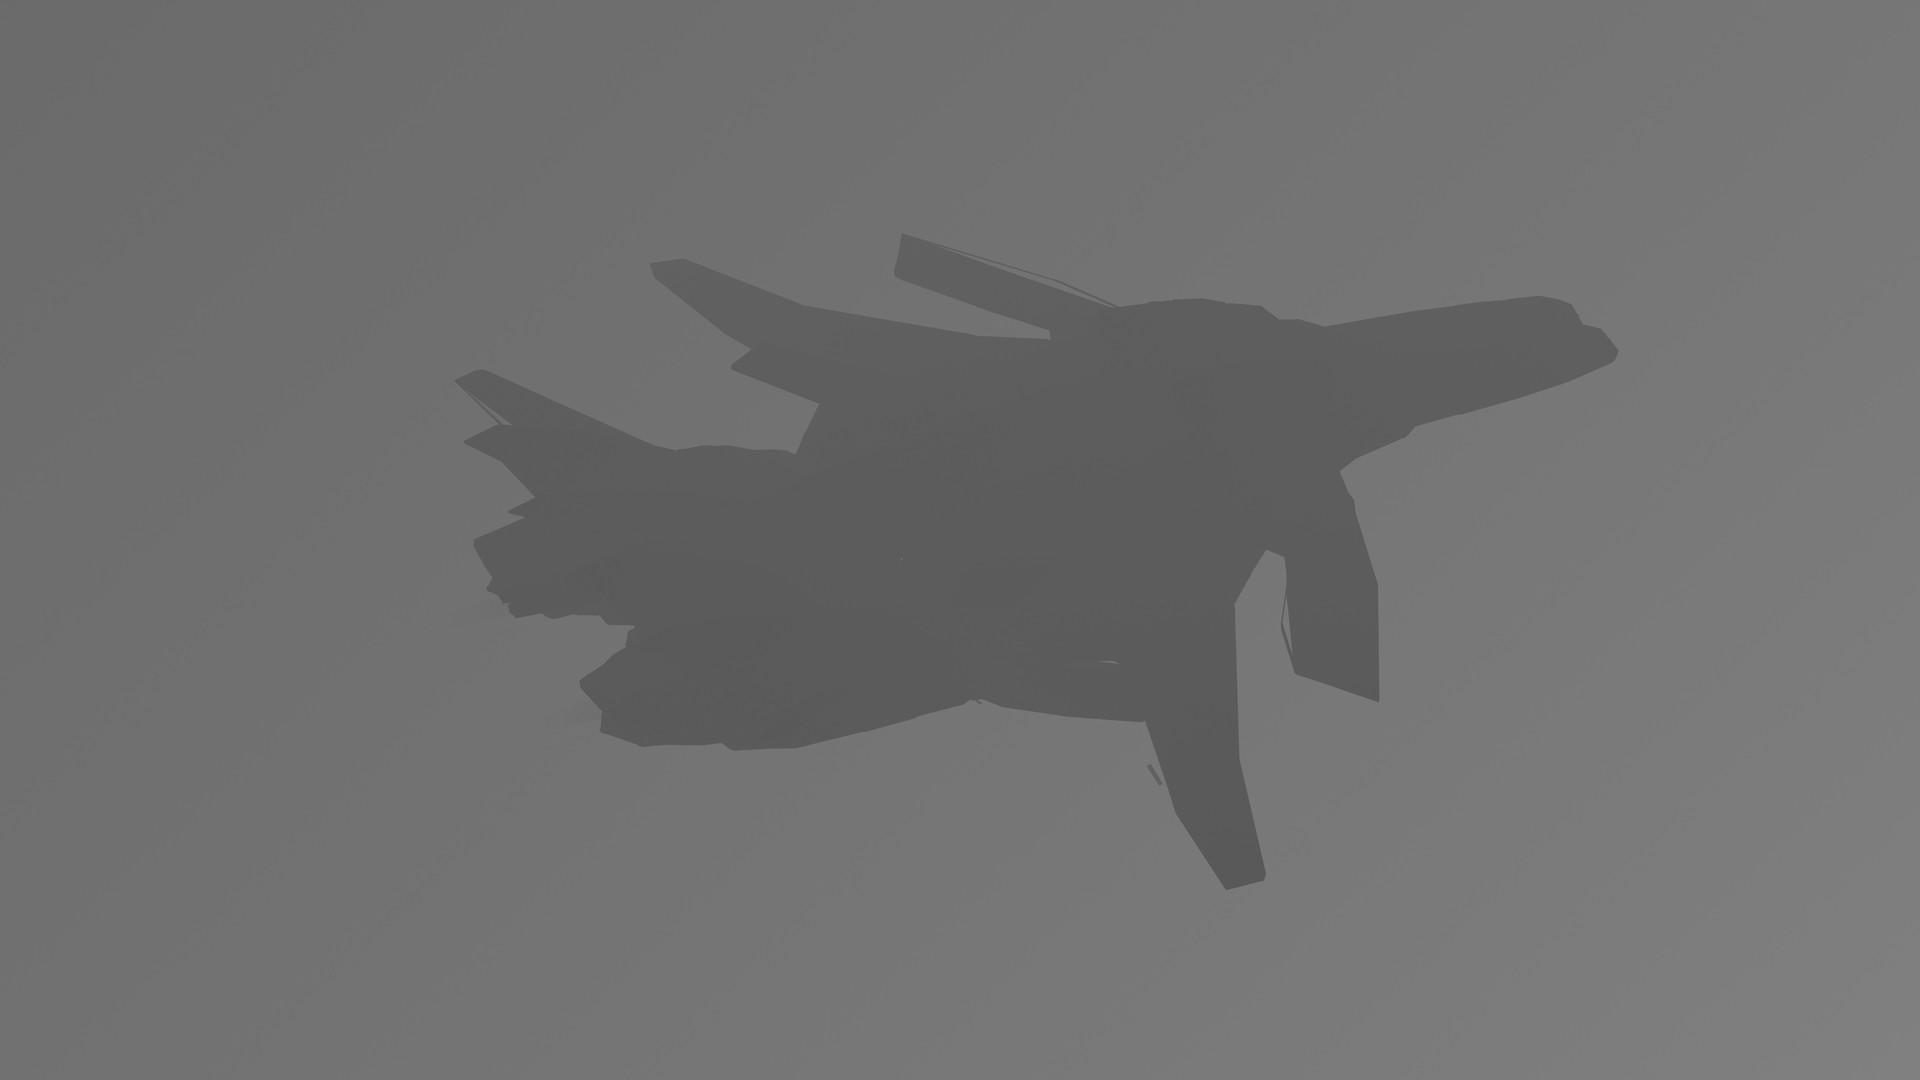 Kresimir jelusic robob3ar 266 050716 ship zdepth